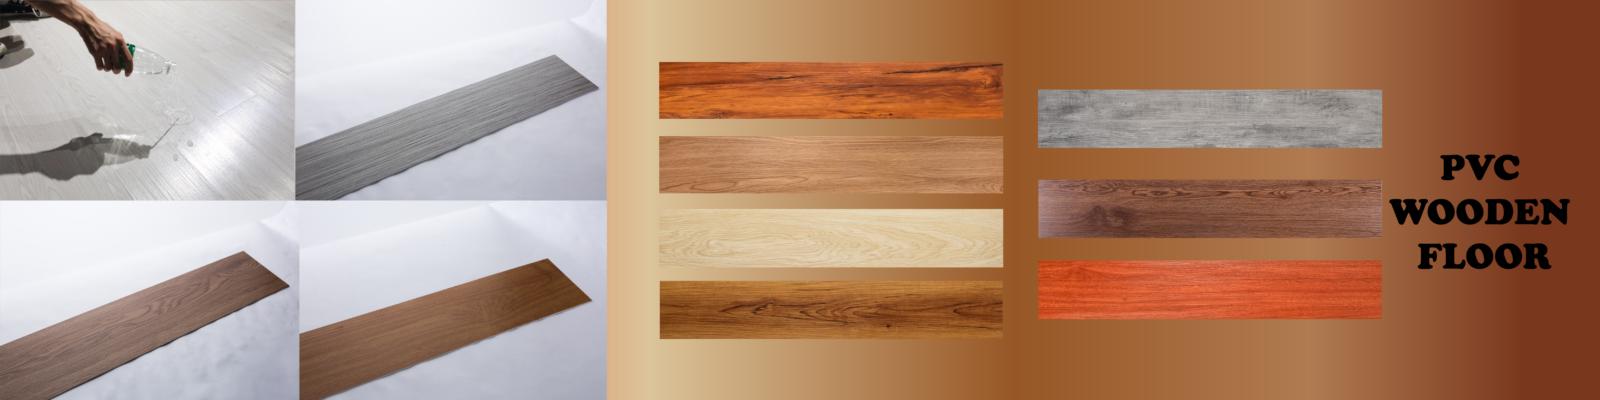 wooden pvc-08